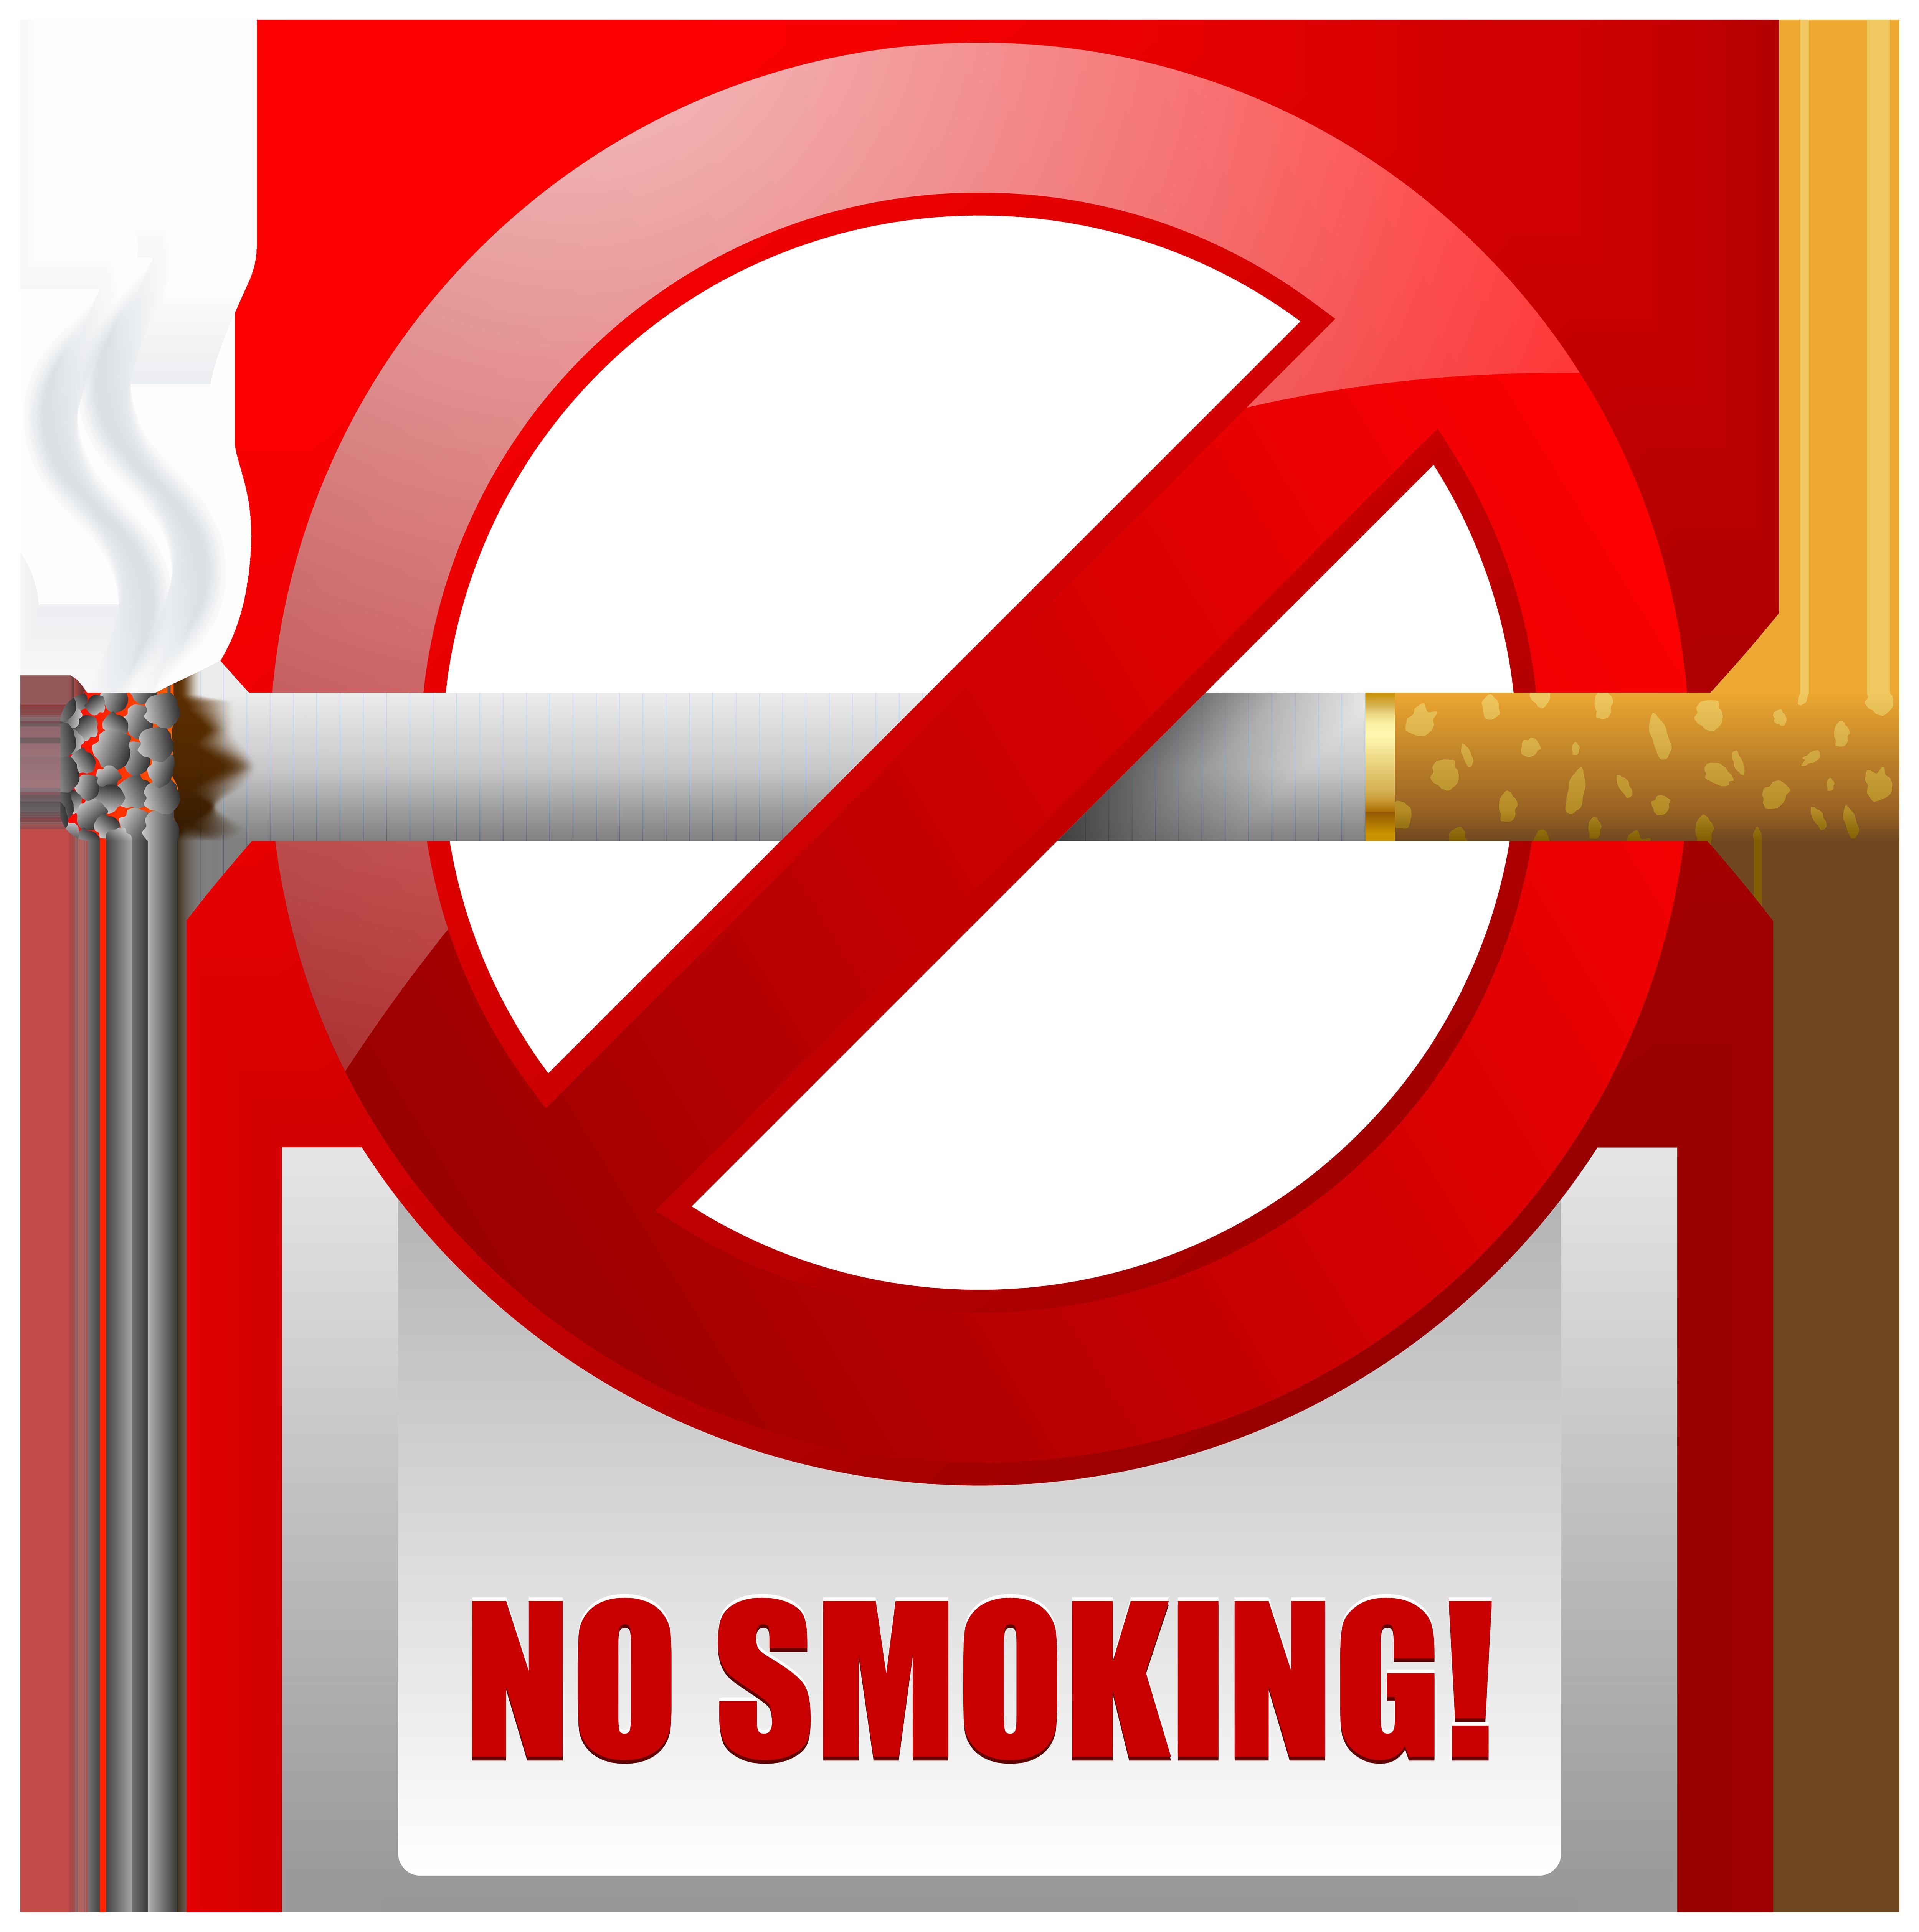 Red No Smoking Warning Sign PNG Clipart.